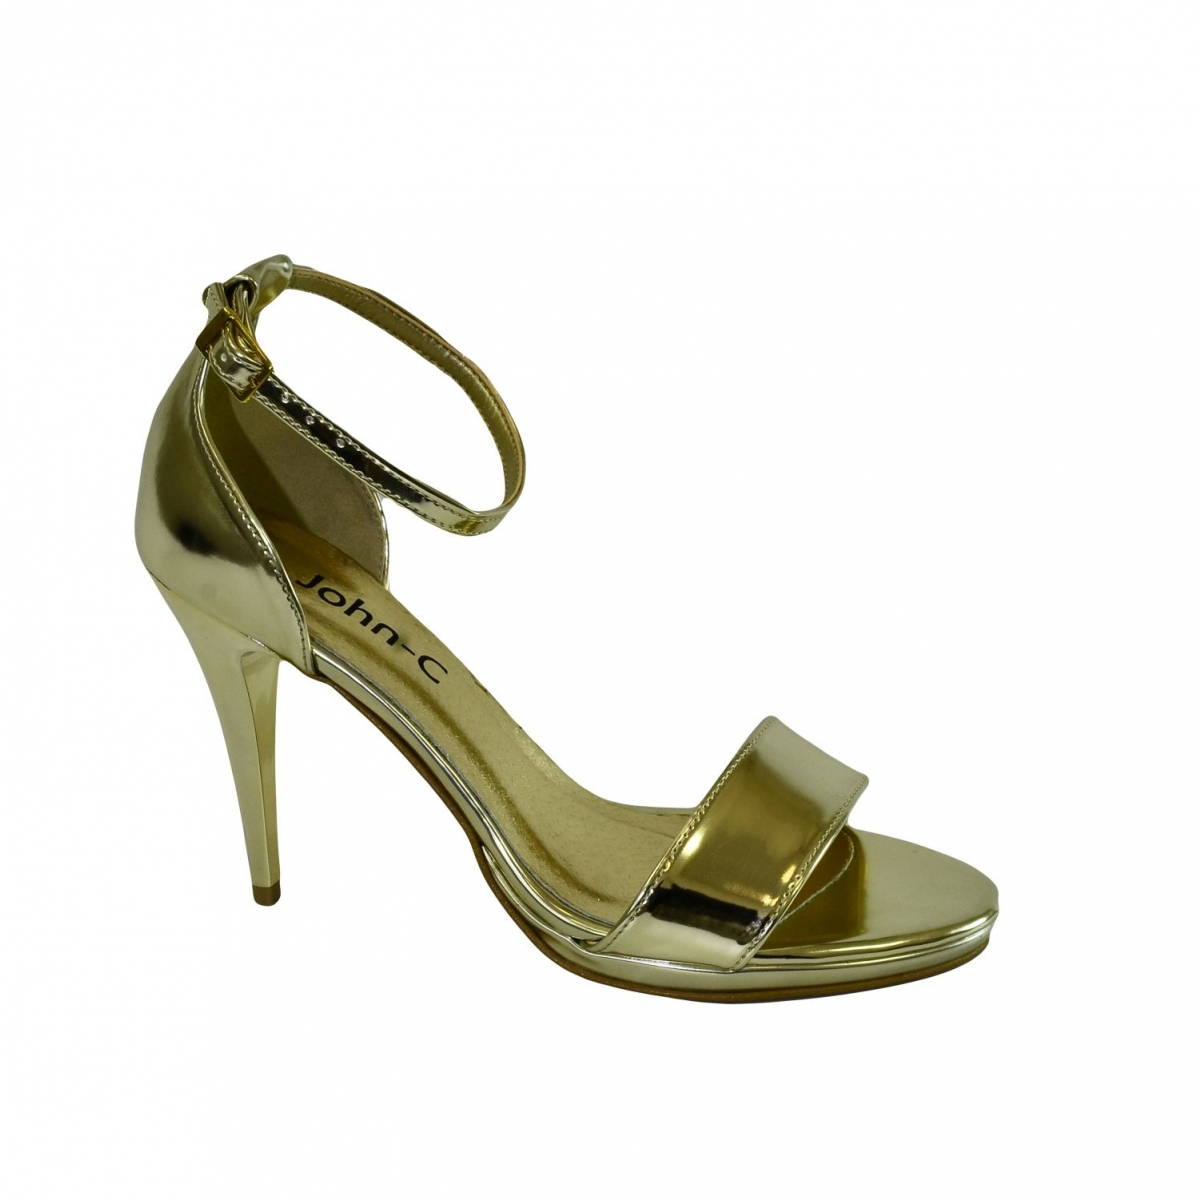 59d6e98aba13 Dámske zlaté sandále ROSARIA - 5